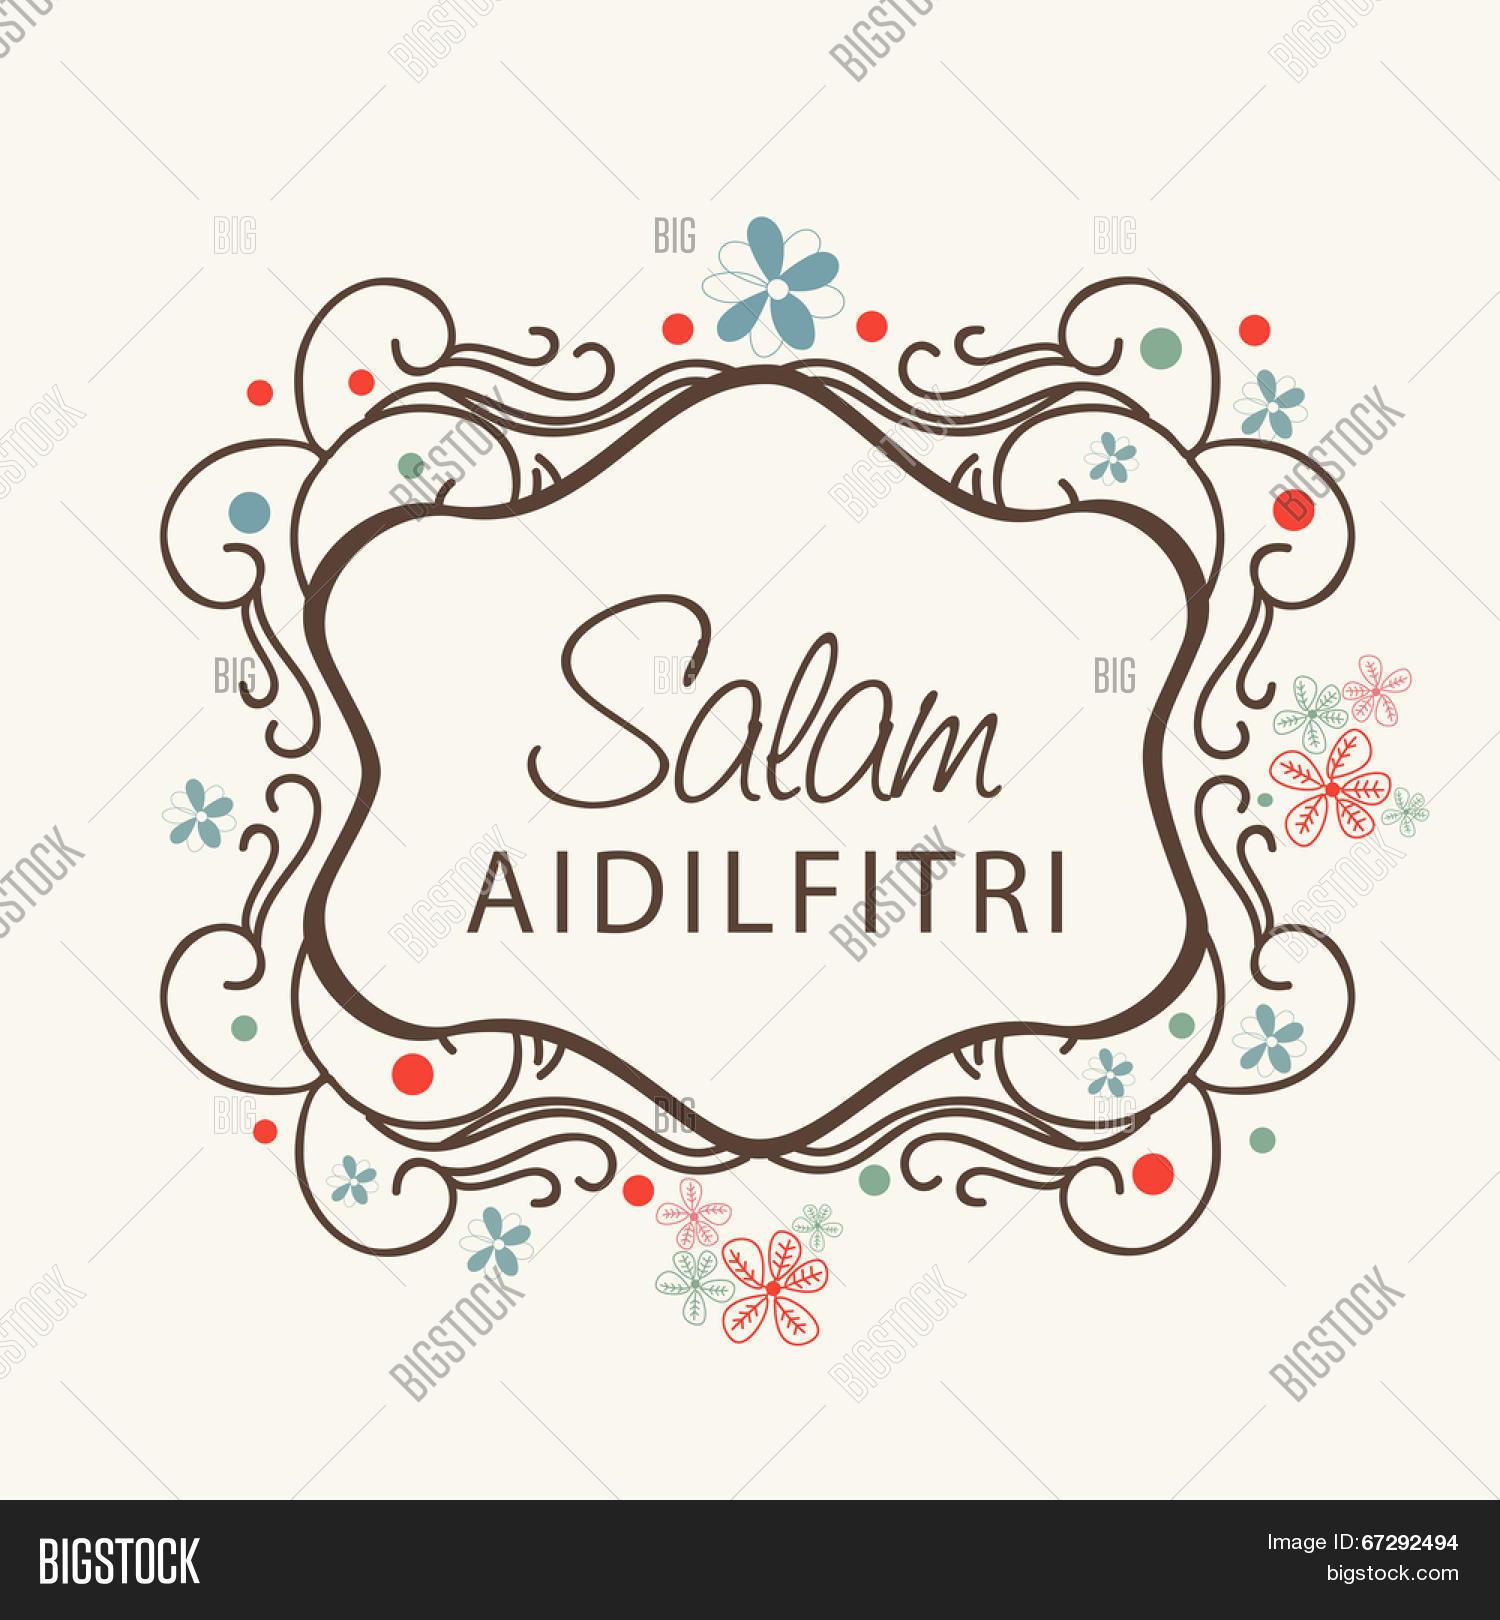 Amazing Beautiful Eid Al-Fitr Decorations - 67292494  You Should Have_467963 .jpg